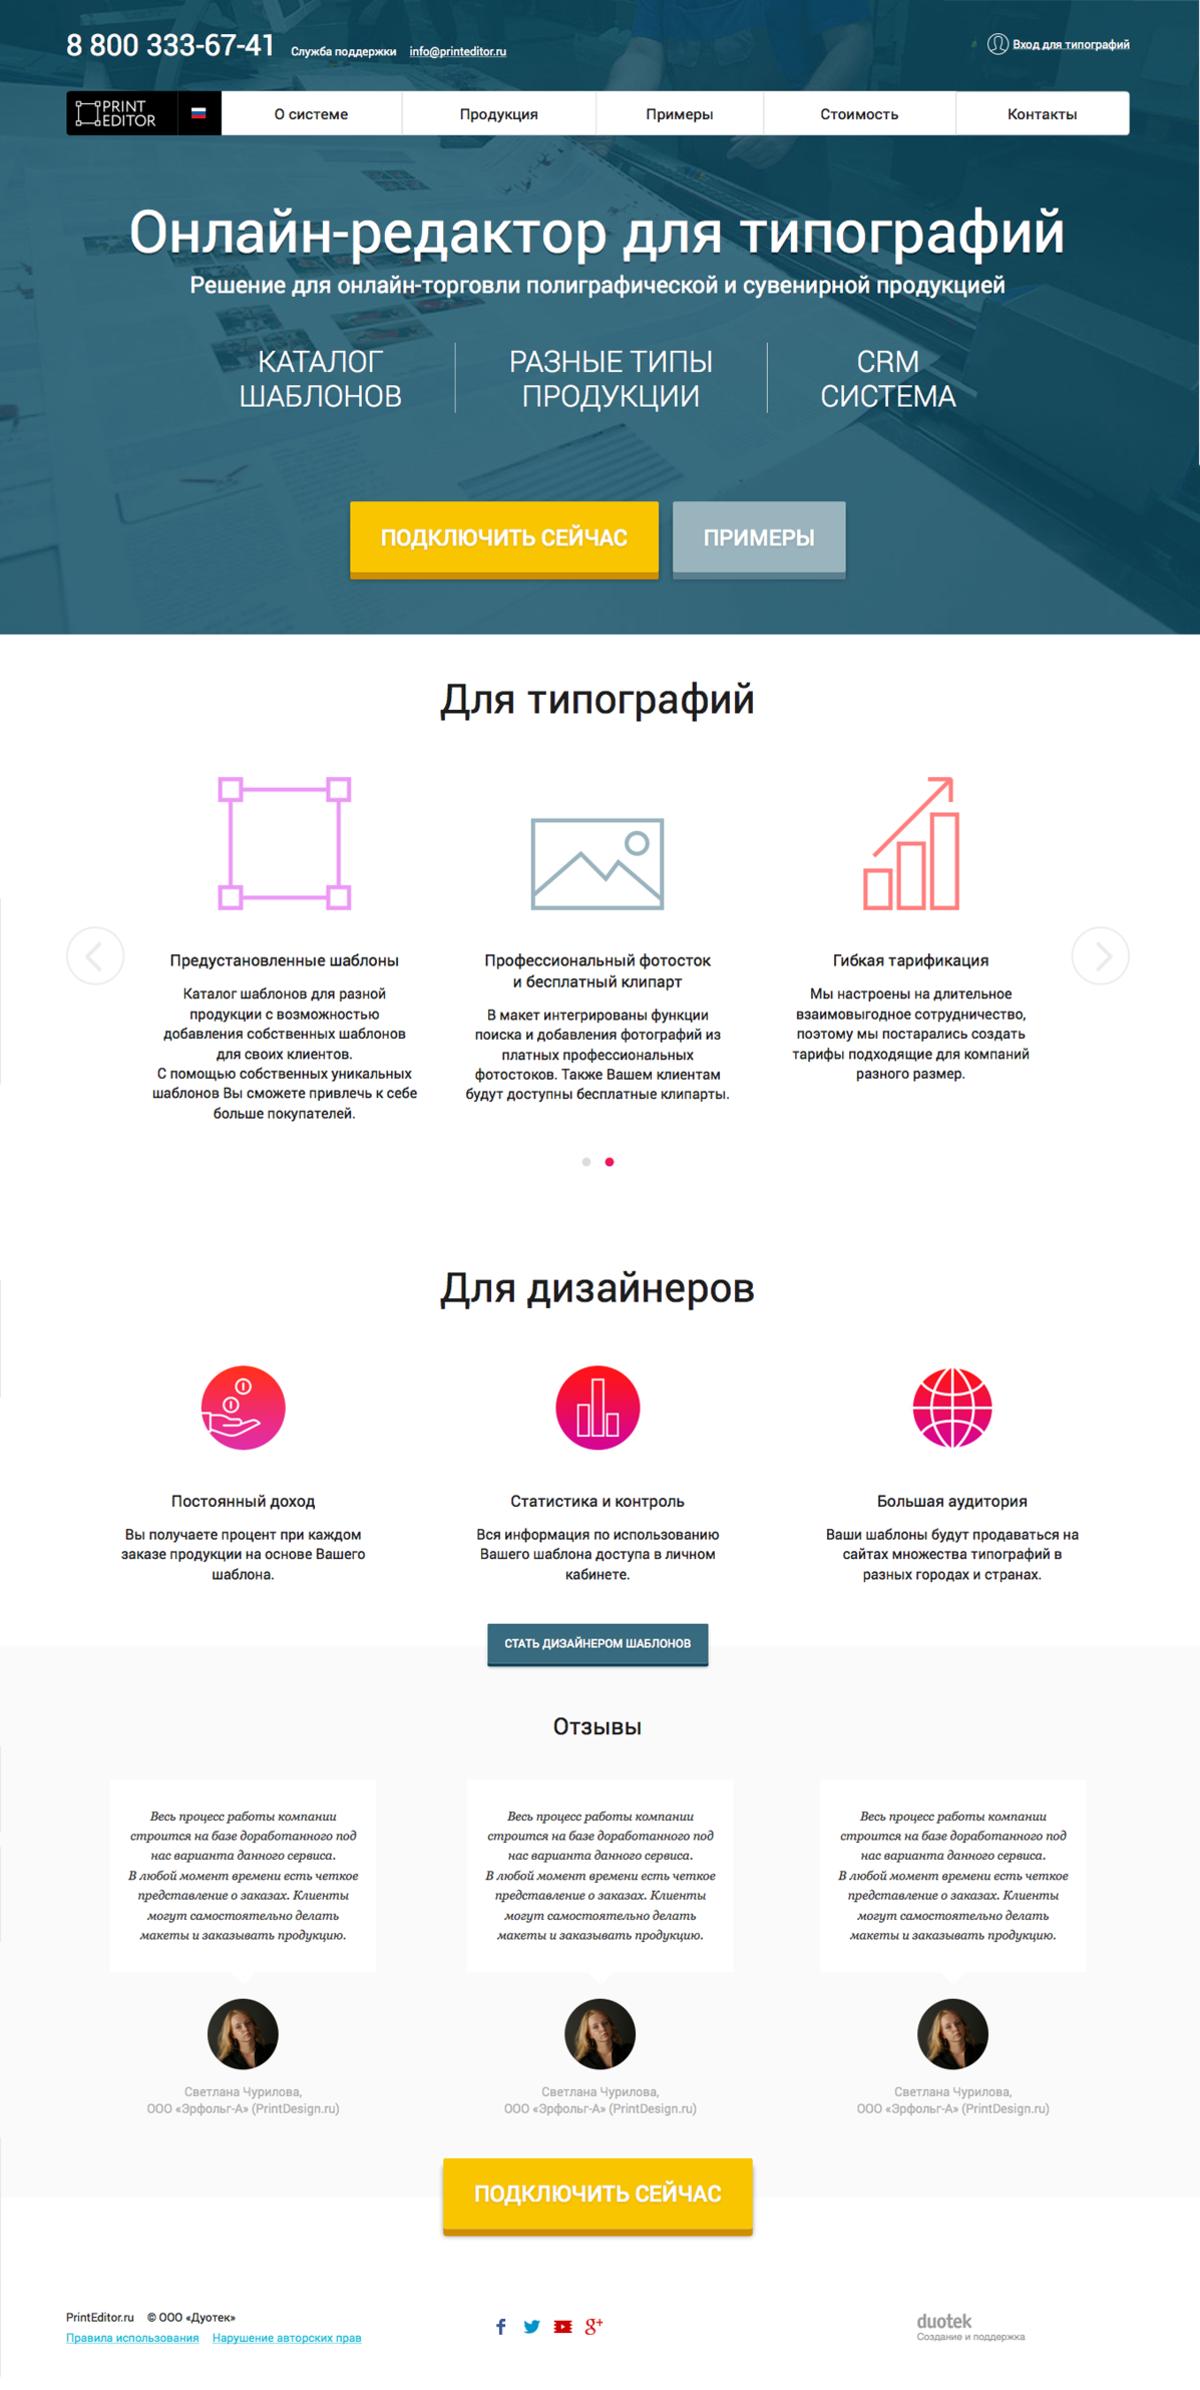 PrintEditor.ru / Проект компании Duotek